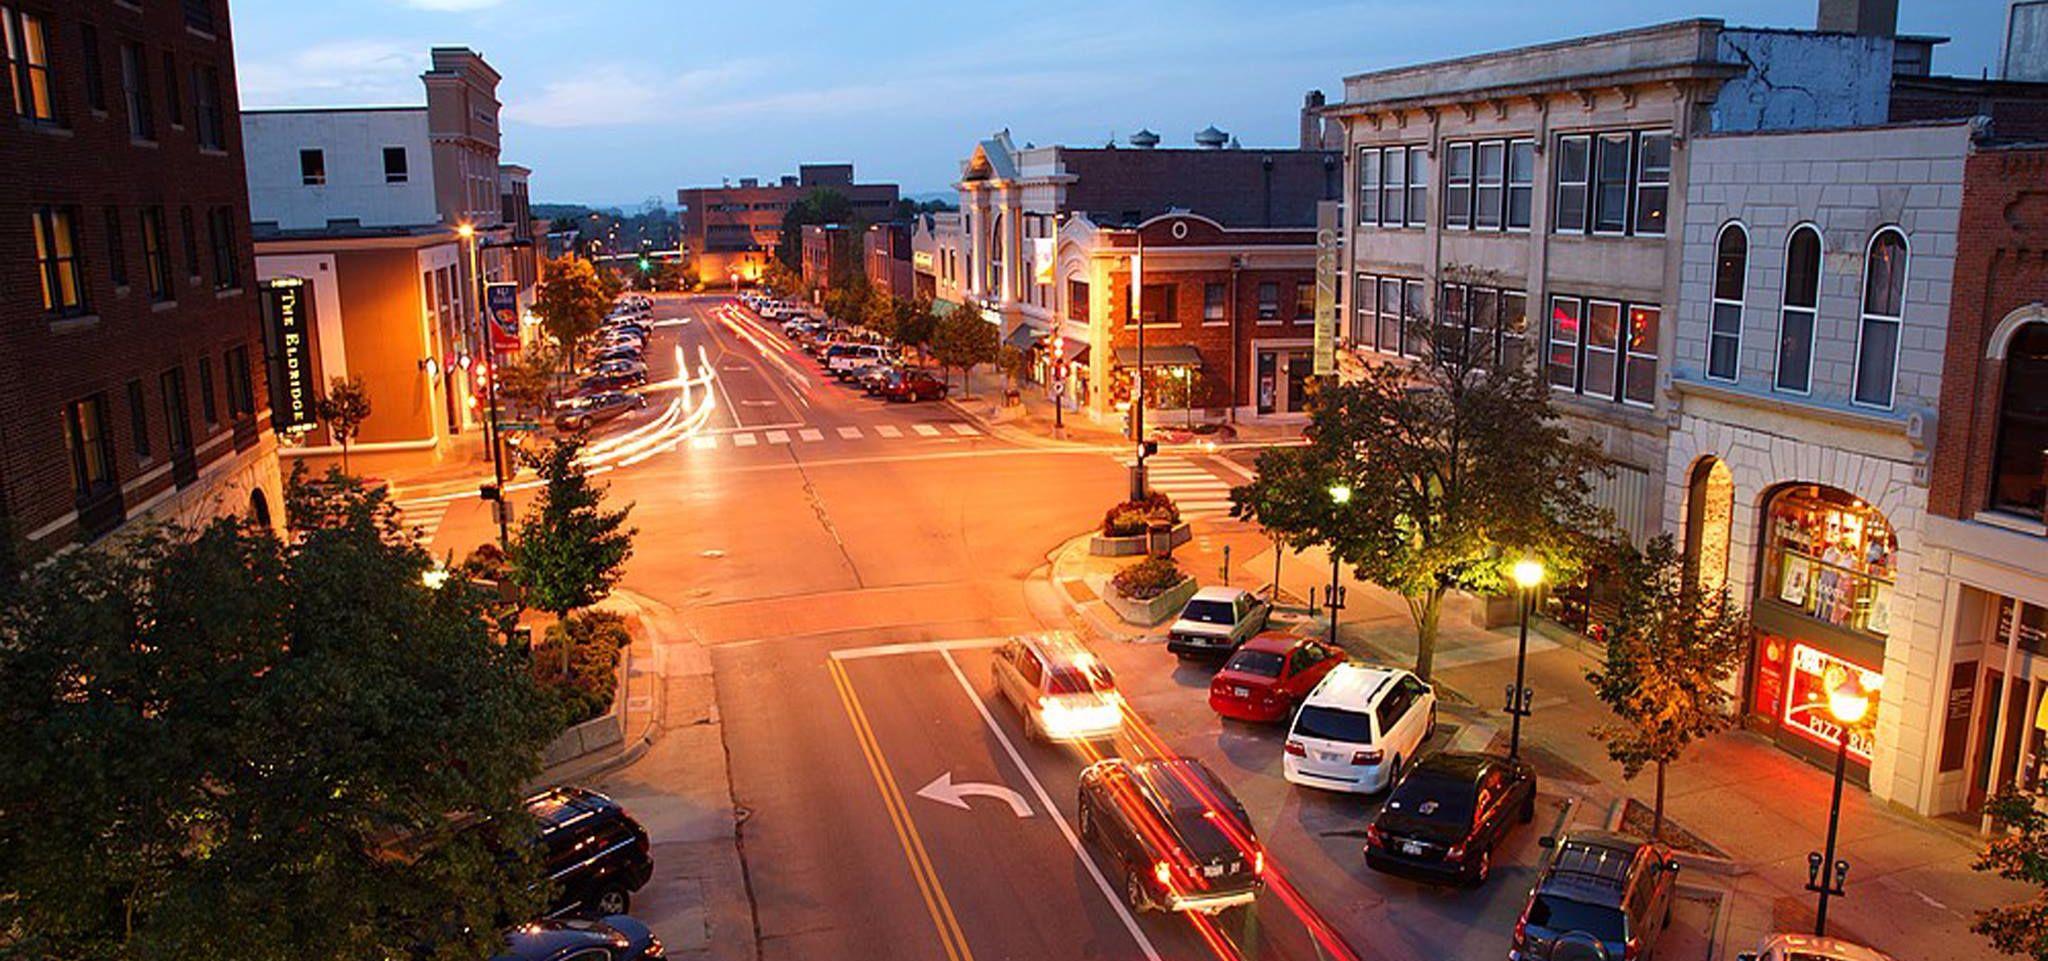 Lawrence, Kansas Bond Investors